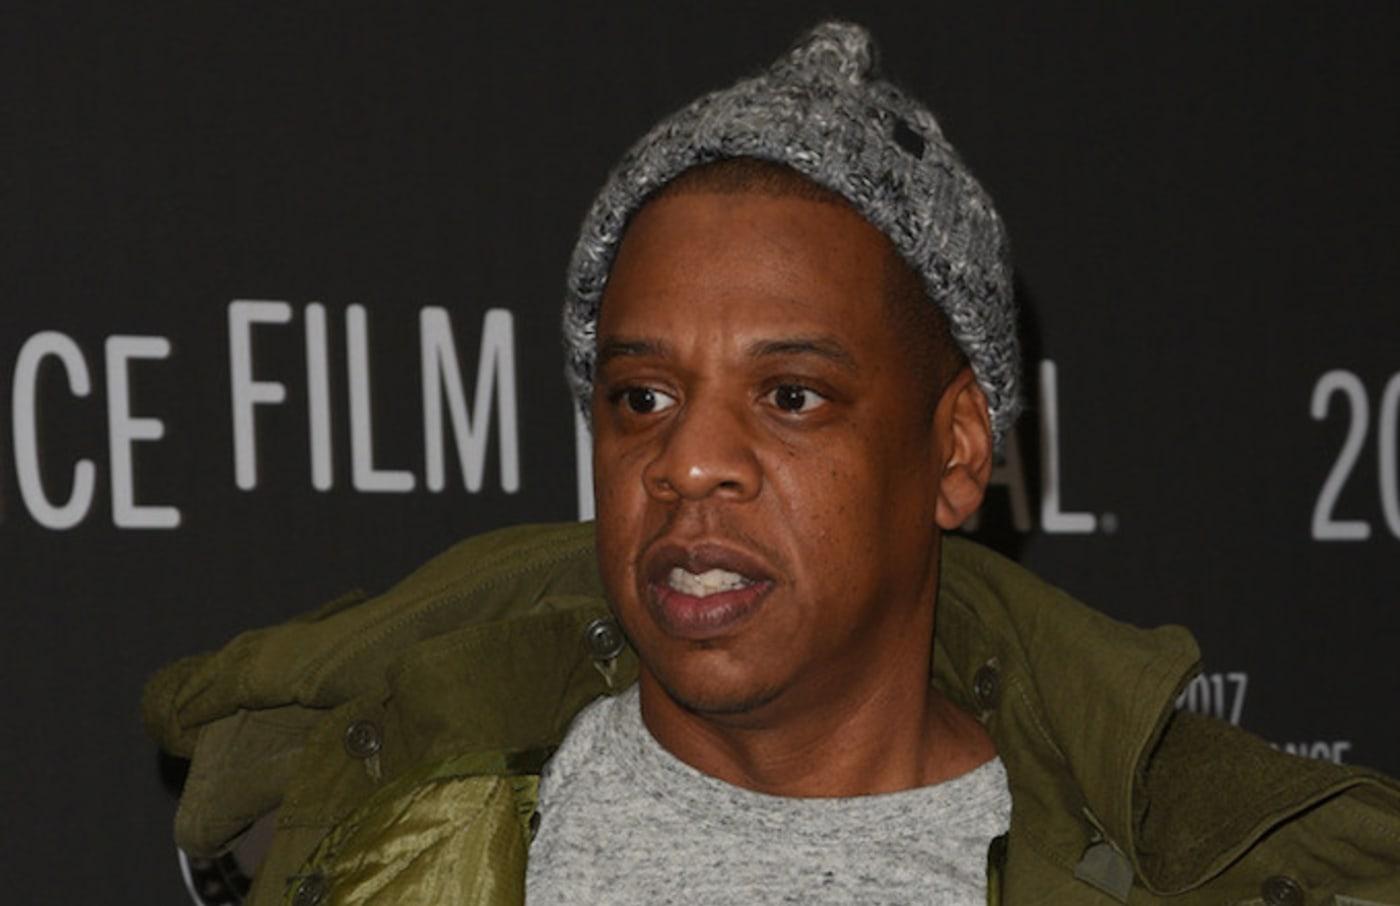 Jay Z attends premiere at the 2017 Sundance Film Festival.